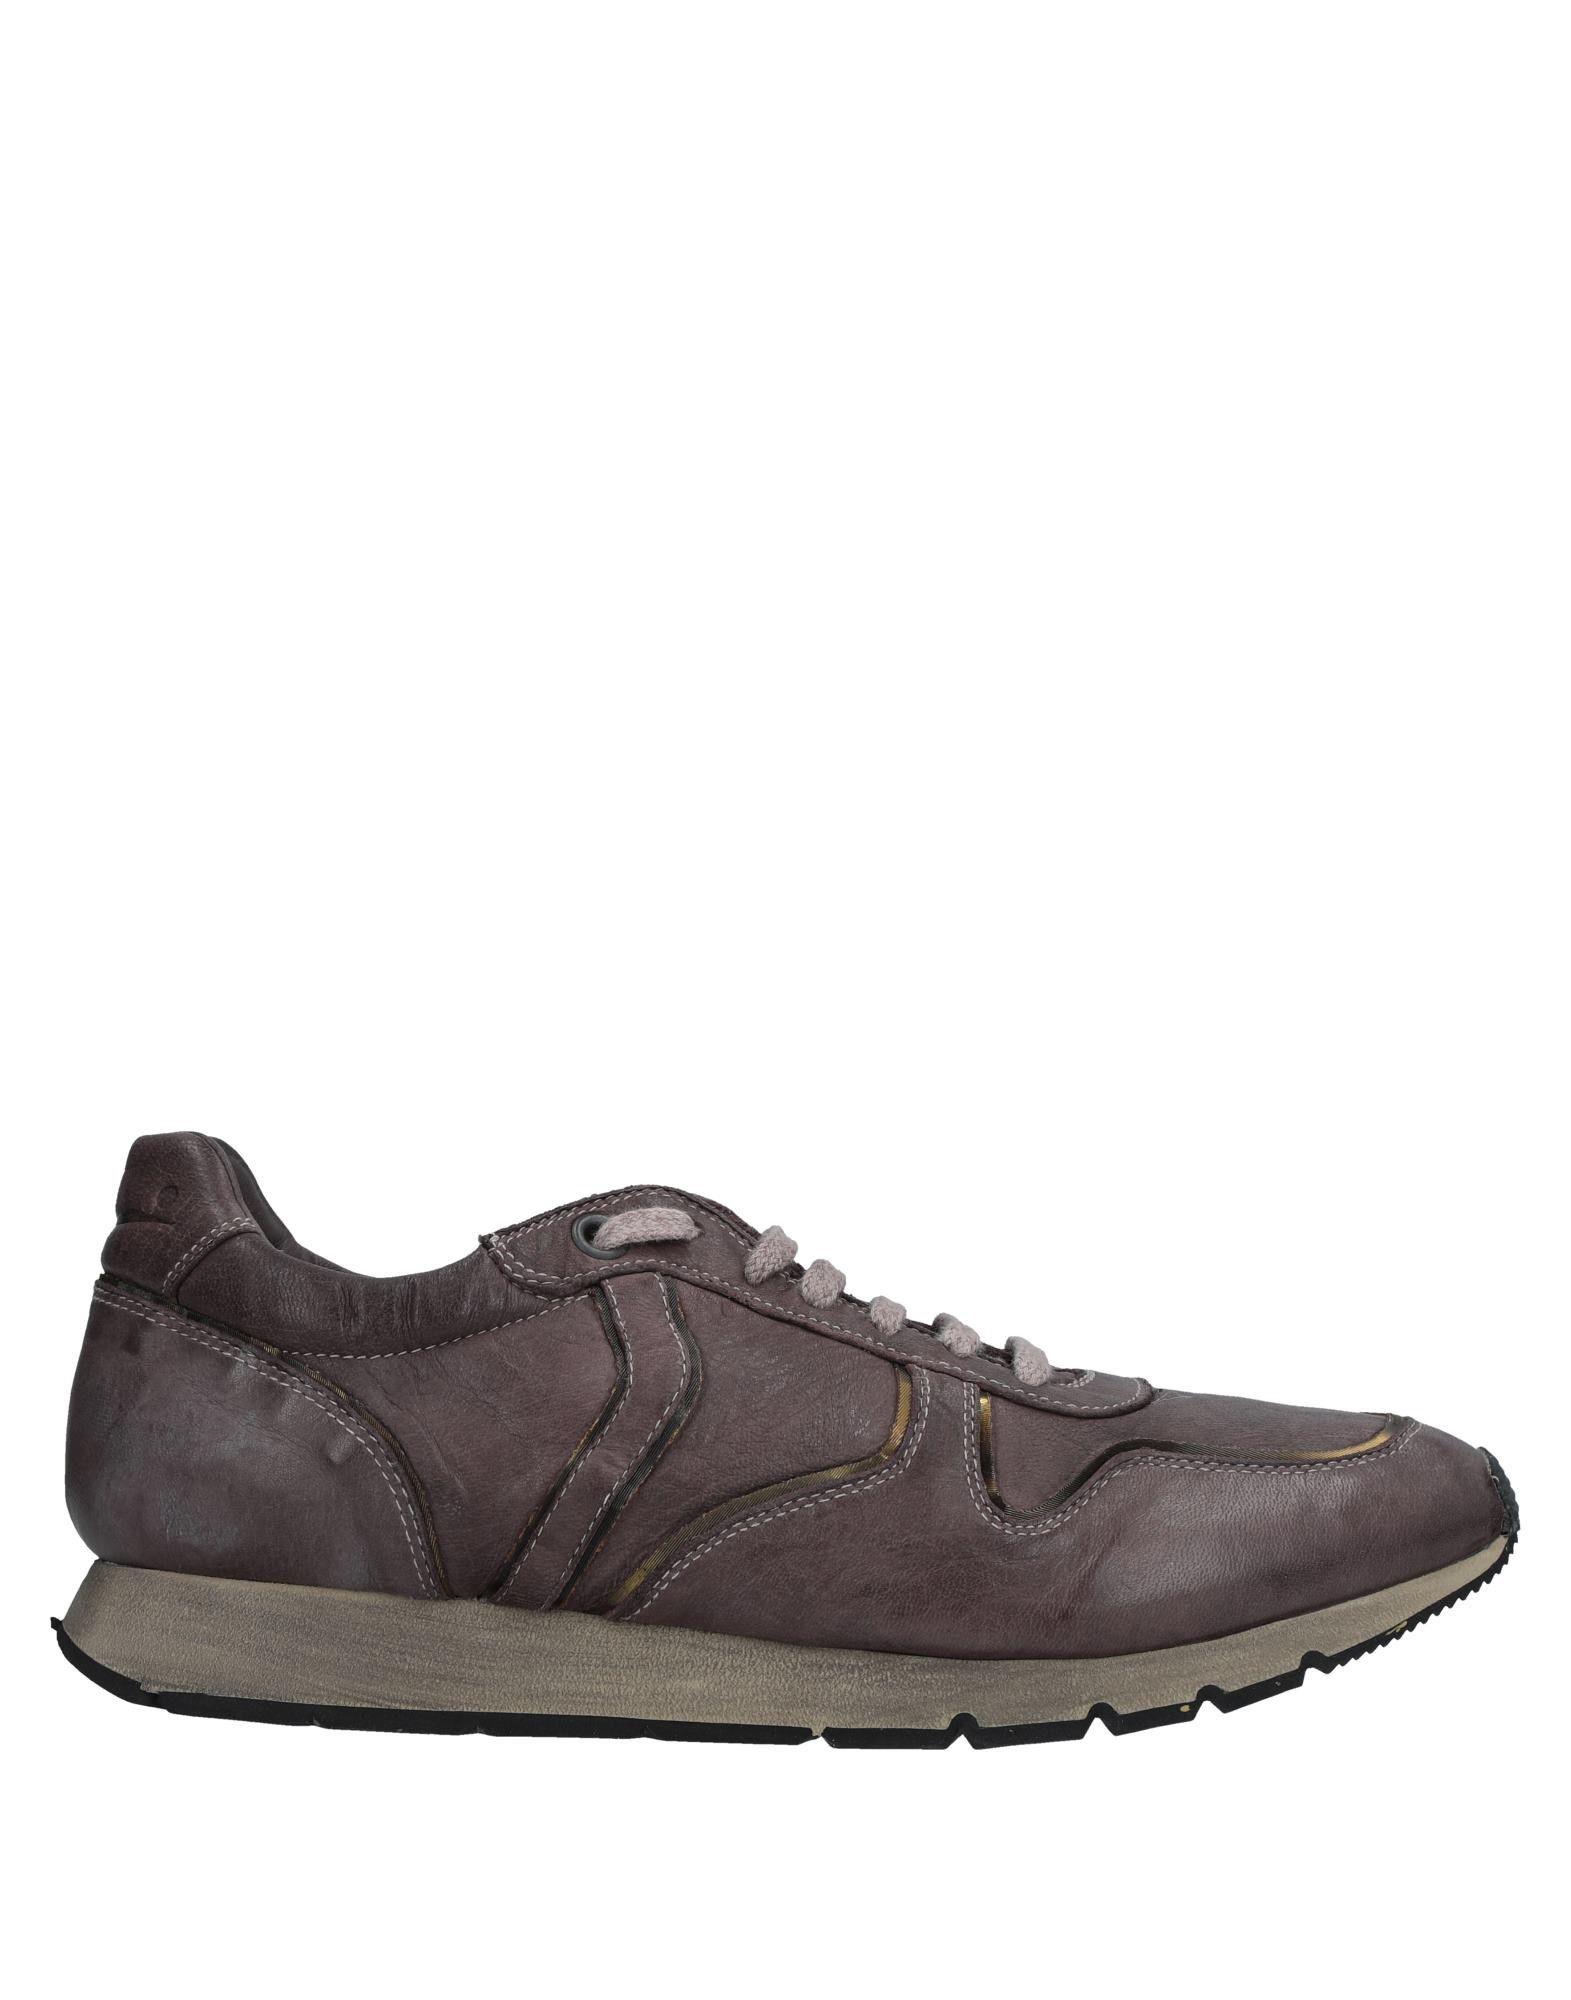 Voile Blanche Sneakers Herren  11527759RE Gute Qualität beliebte Schuhe